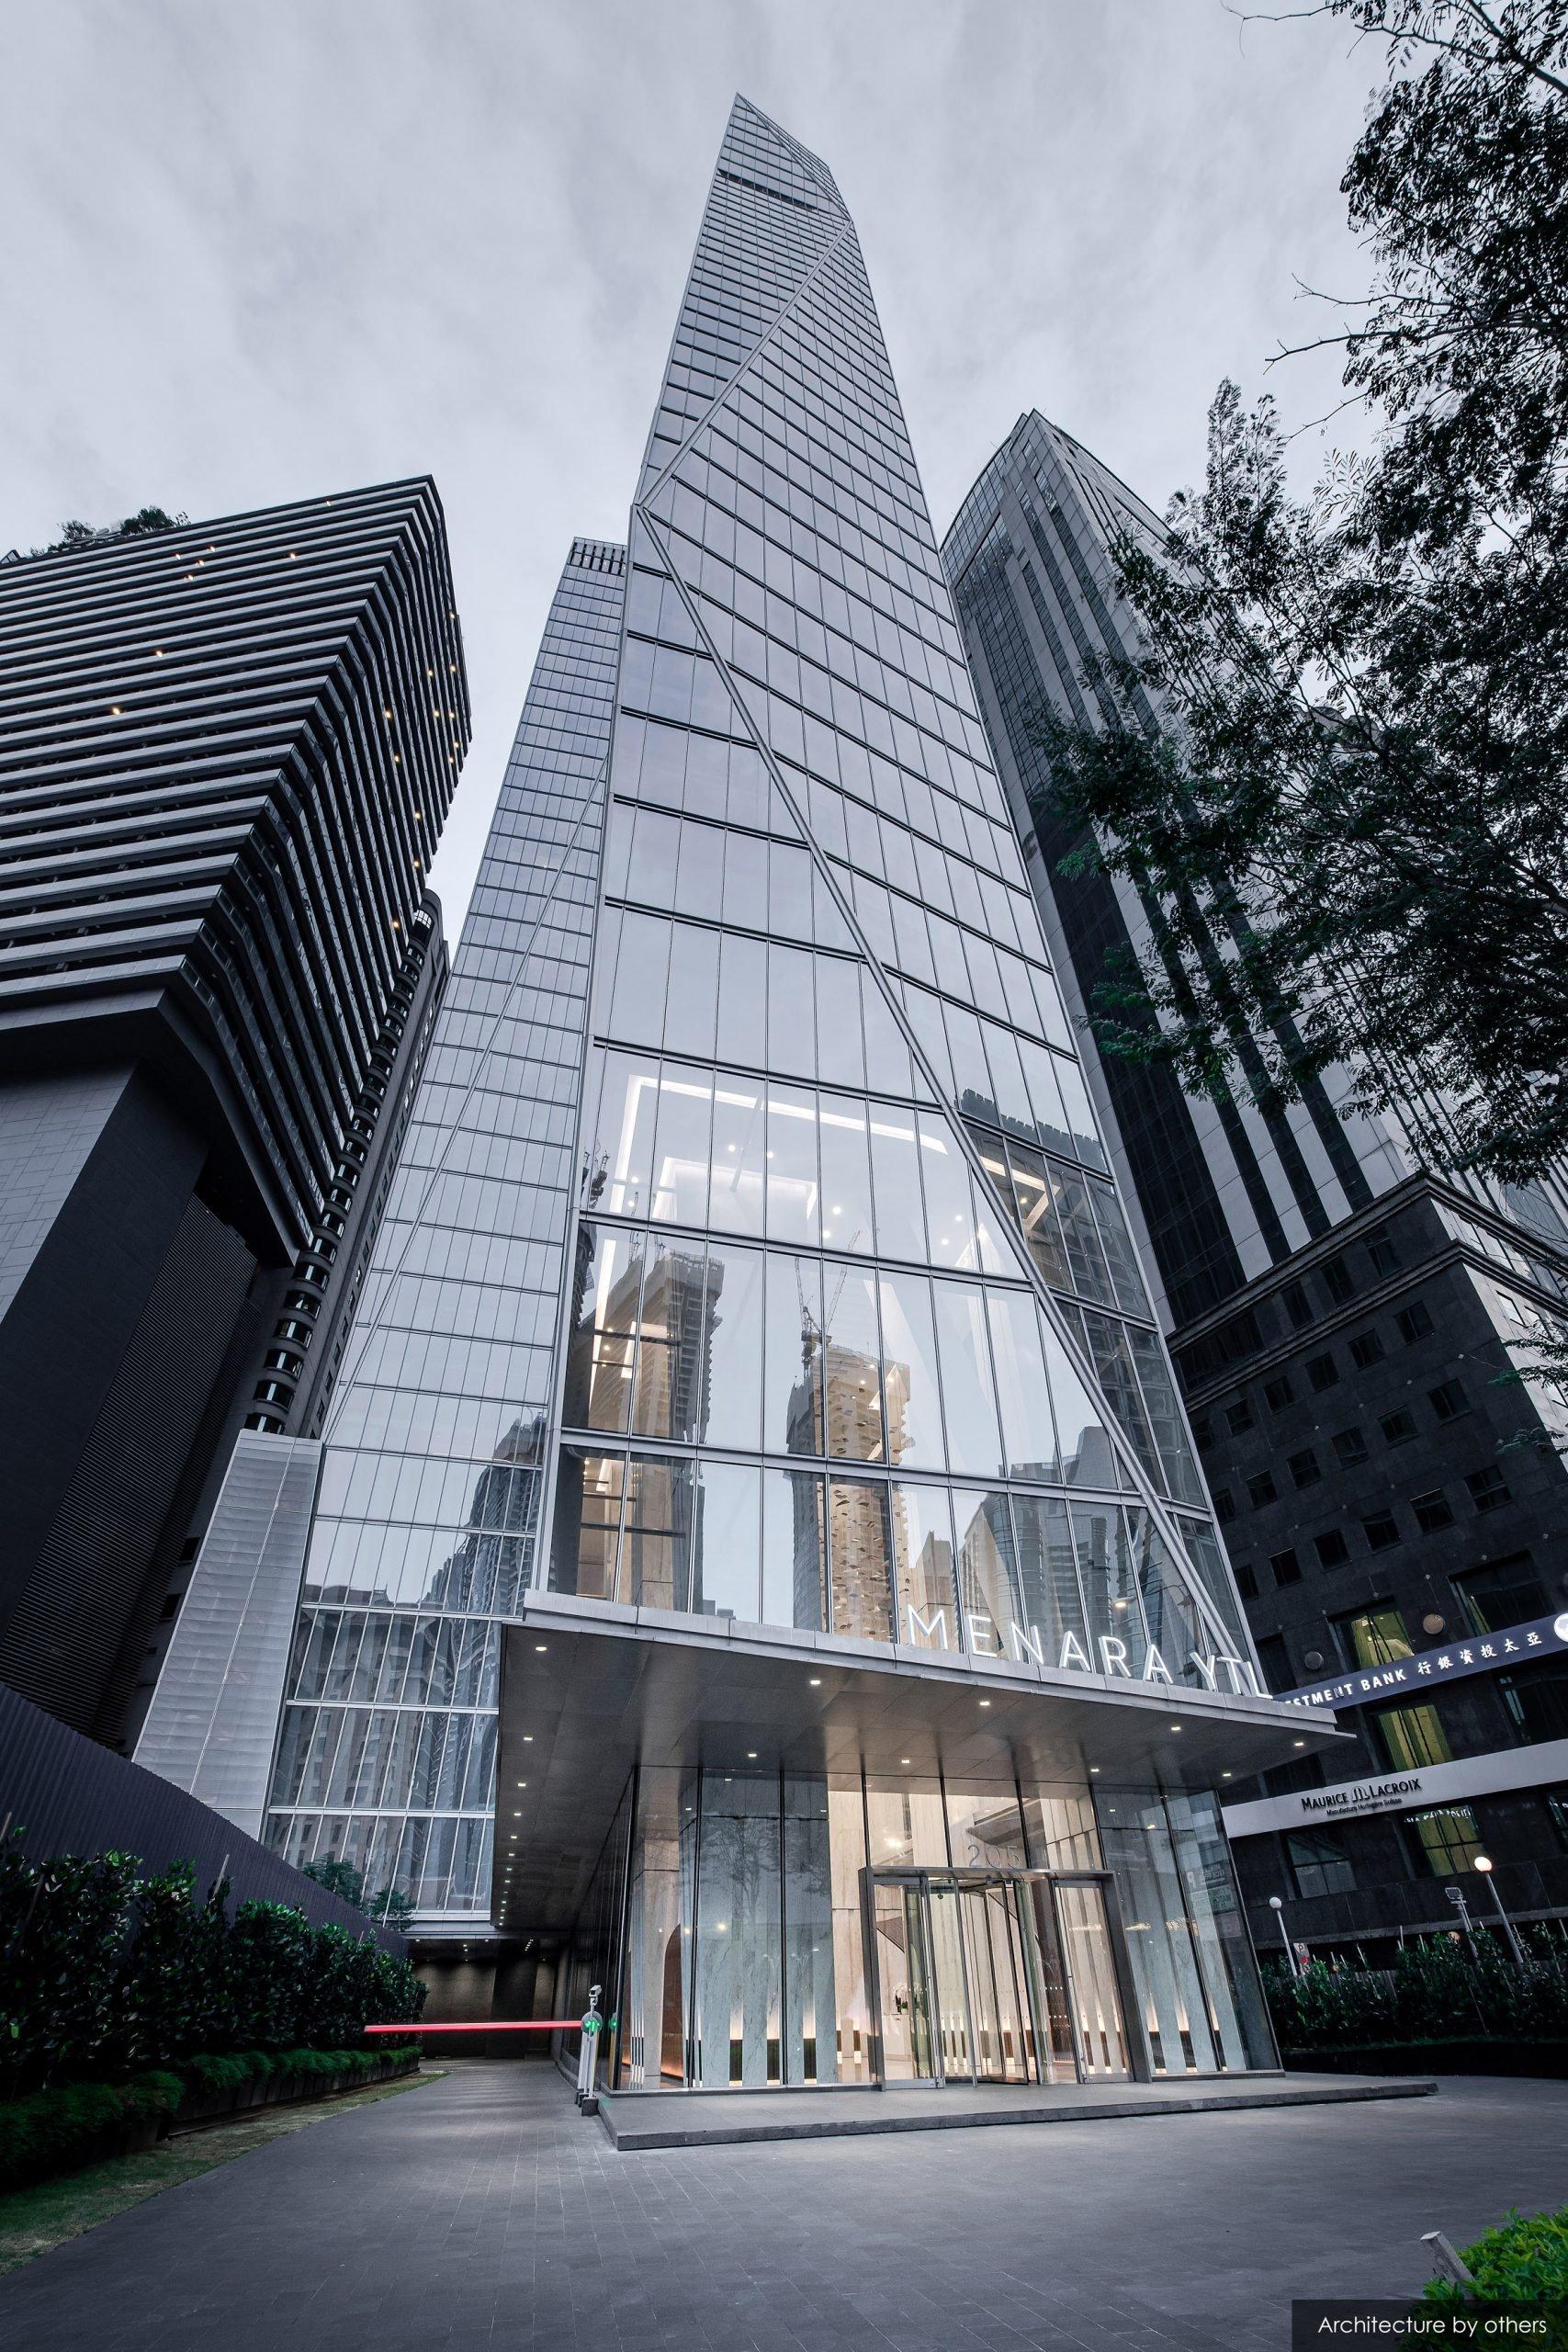 The YTL Headquarters skyscraper in Kuala Lumpur by Kohn Pedersen Fox